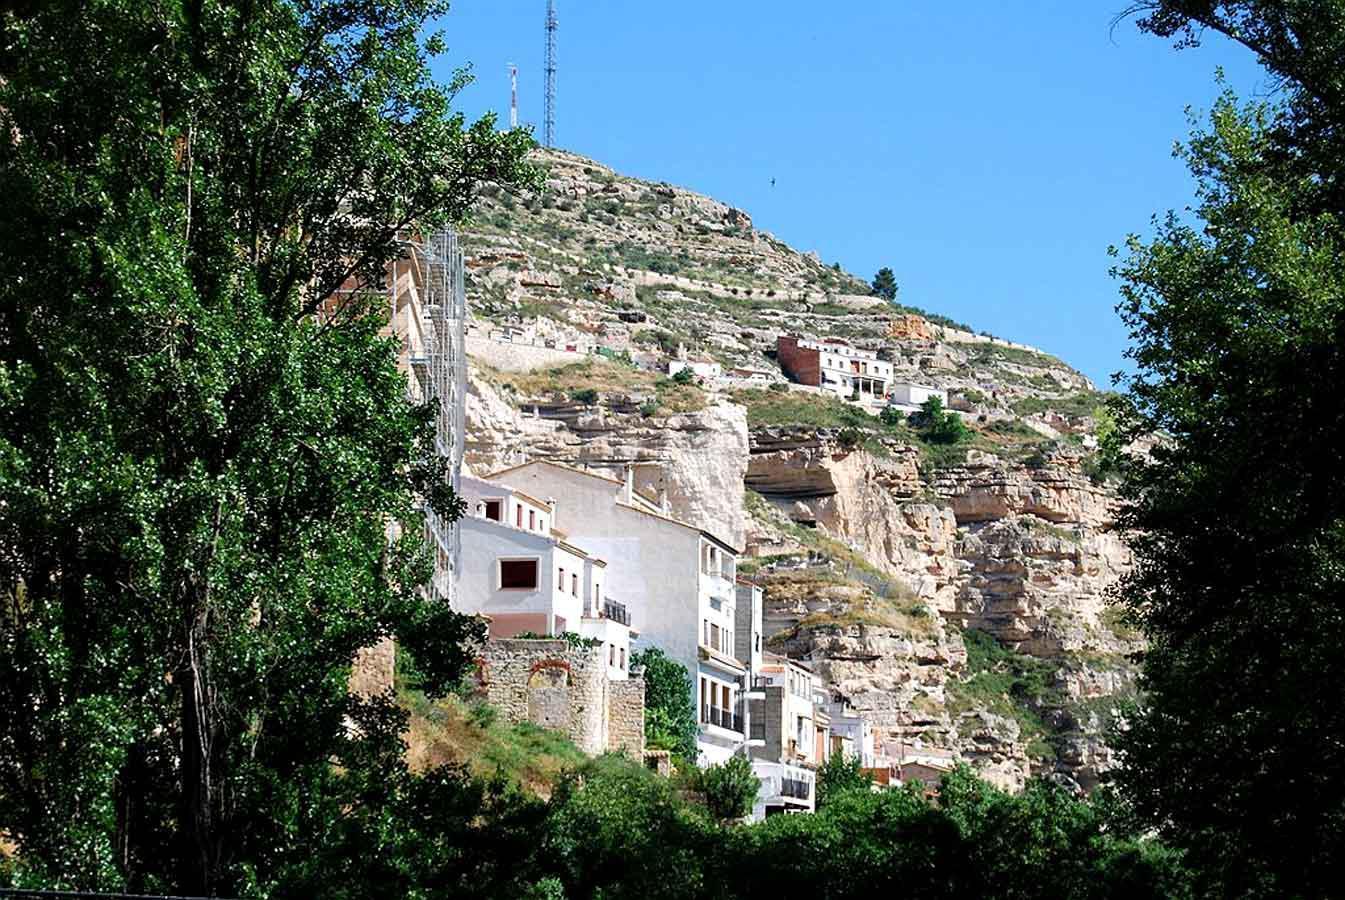 Fotos de la mansi n albacete alcala del jucar clubrural for Casa rural mansion terraplen seis